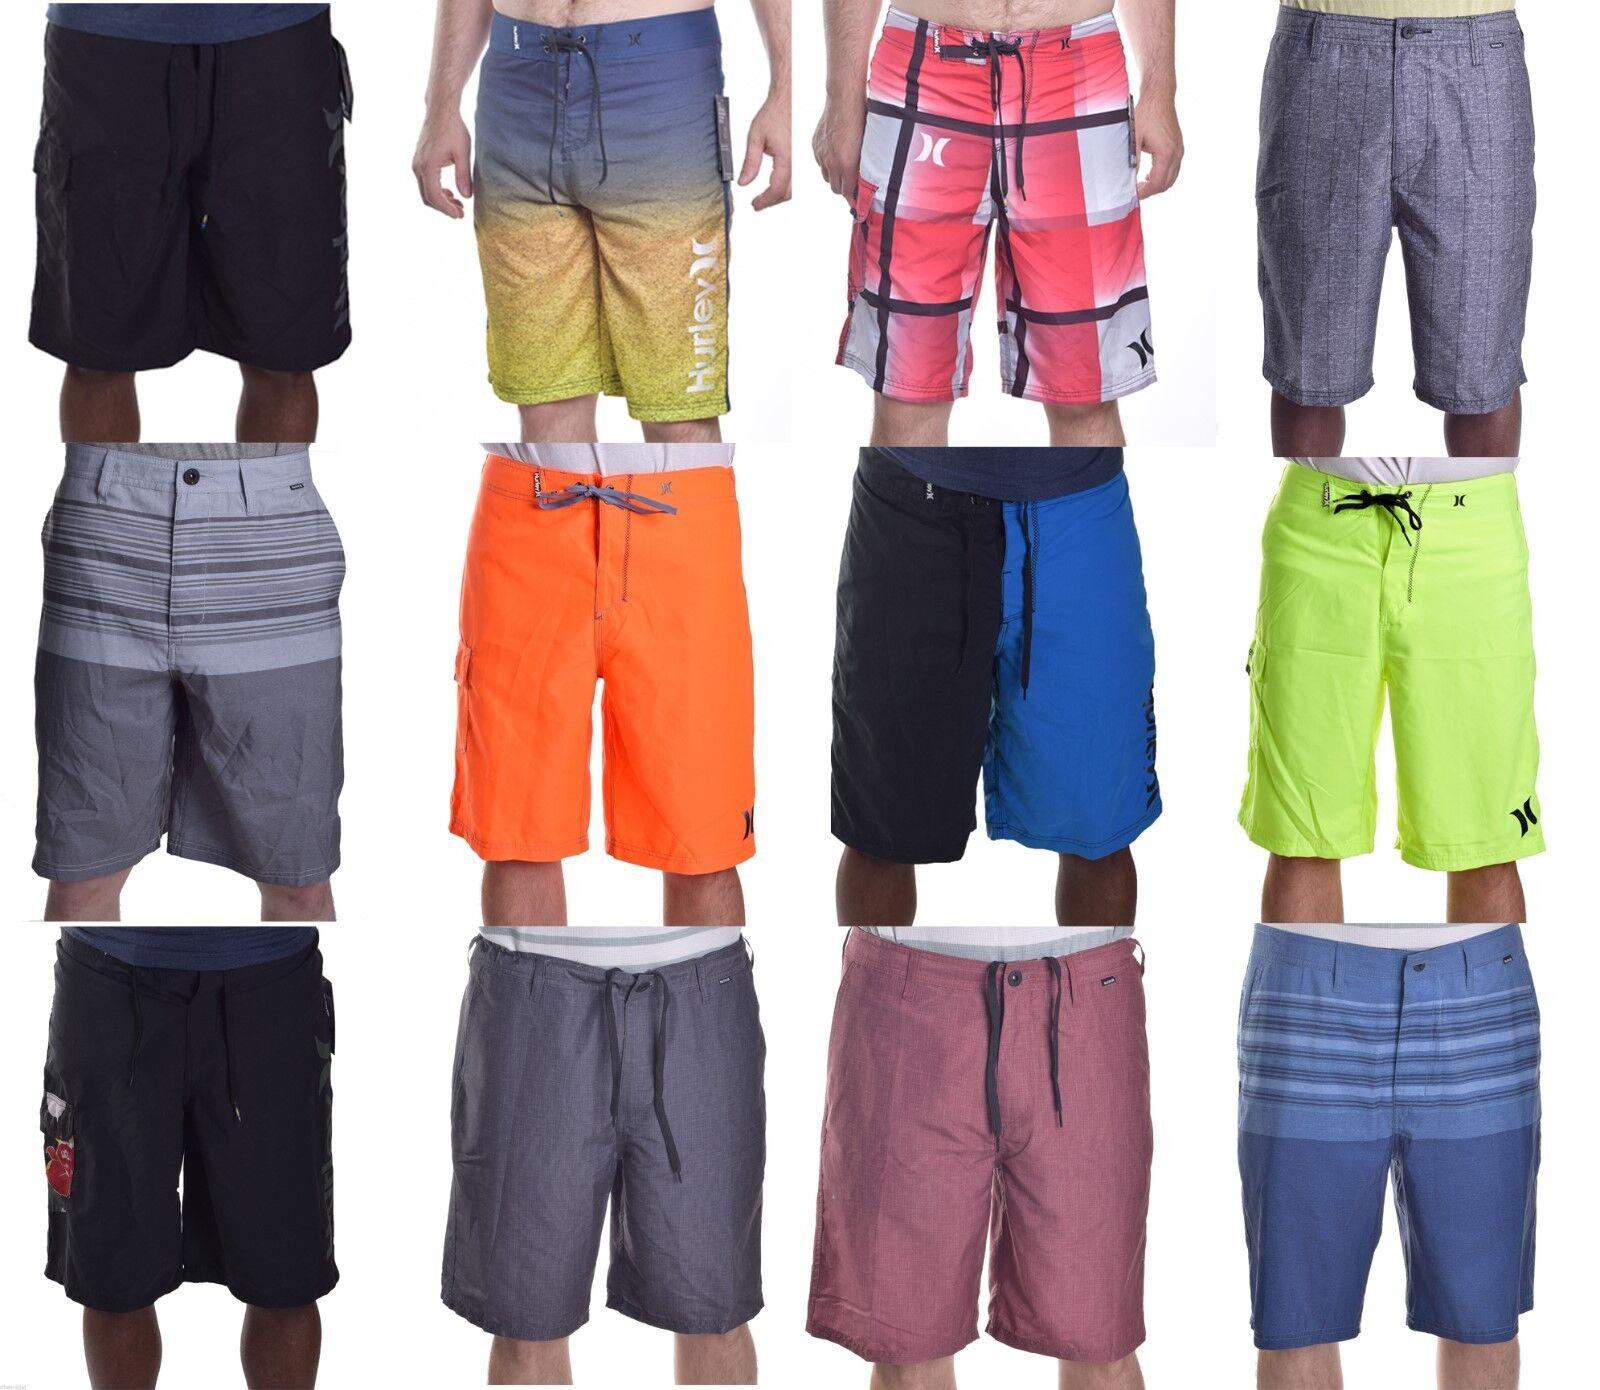 Hurley Men's Polyester Swim Board Shorts Choose Color & Size